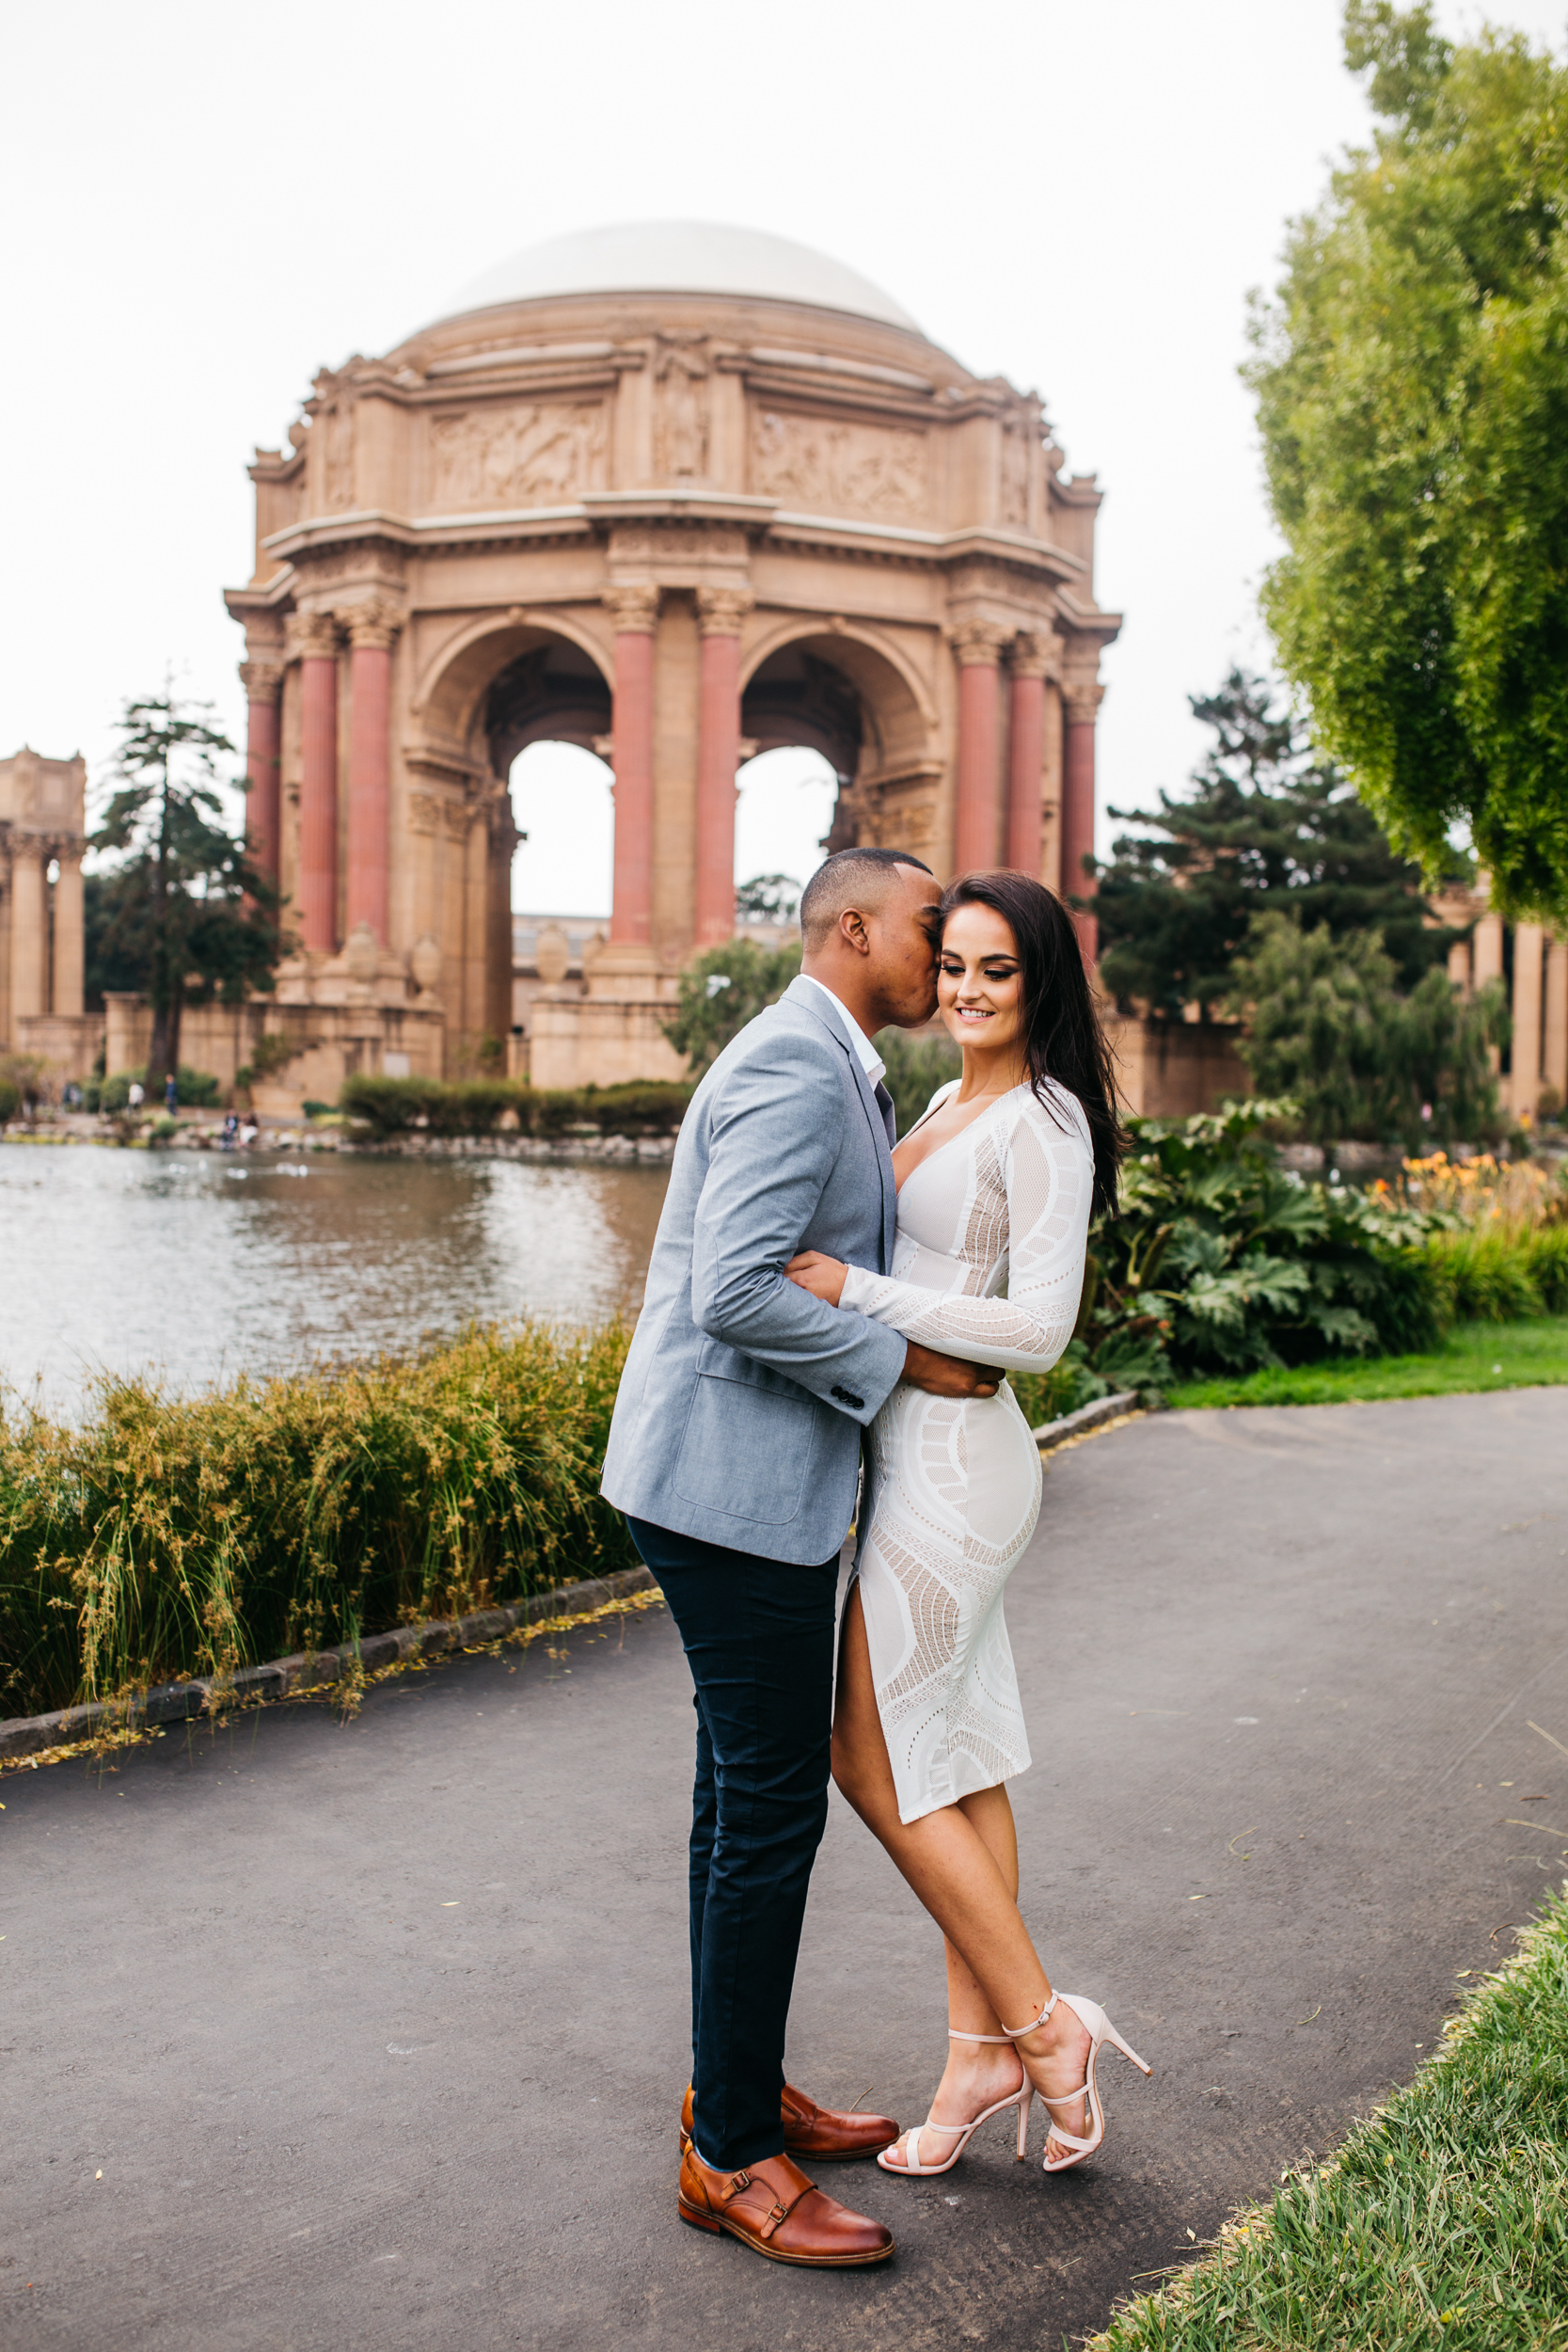 Engagement Photos-Ranalla Photo and Films-8.jpg